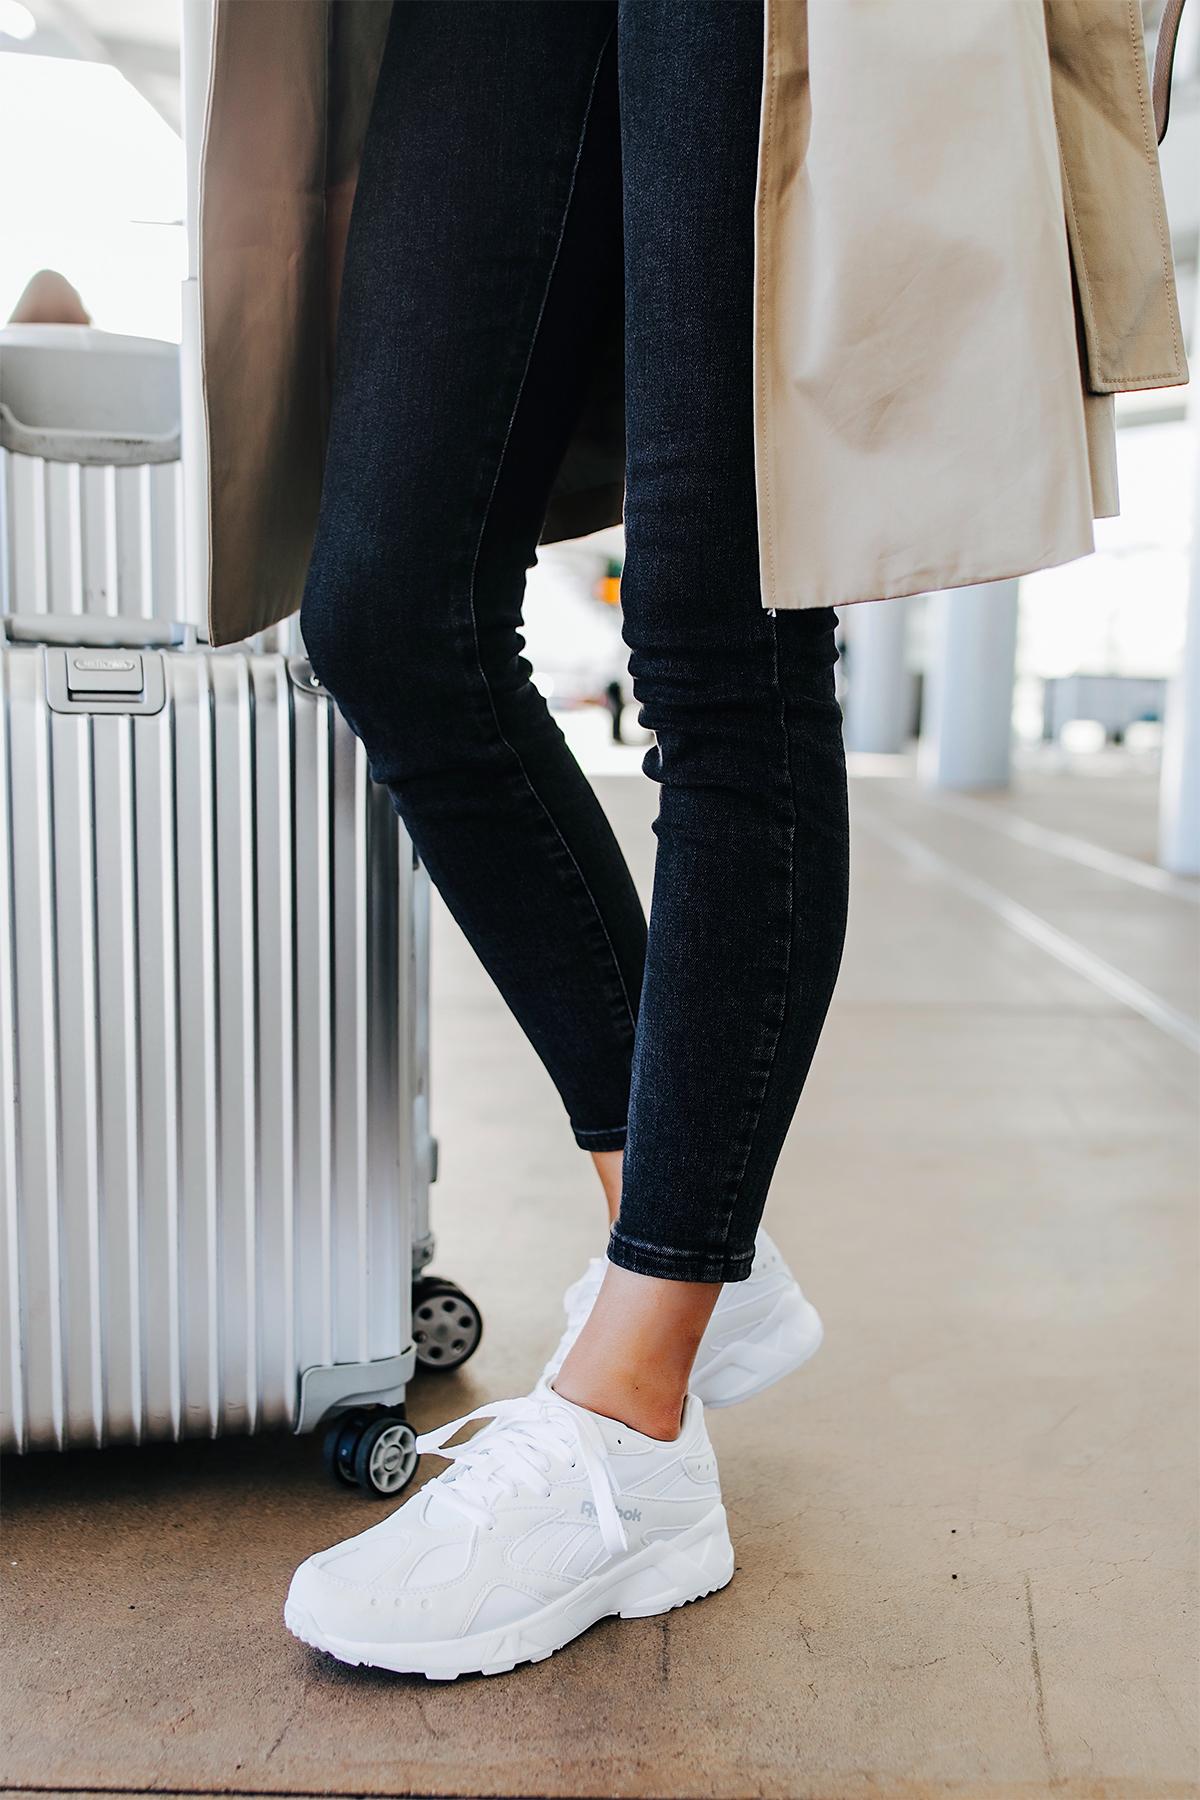 Woman Wearing Airport Travel Outfit Black Skinny Jeans Reebok Aztrek White Sneakers Rimowa Luggage Fashion Jackson San Diego Fashion Blogger Street Style